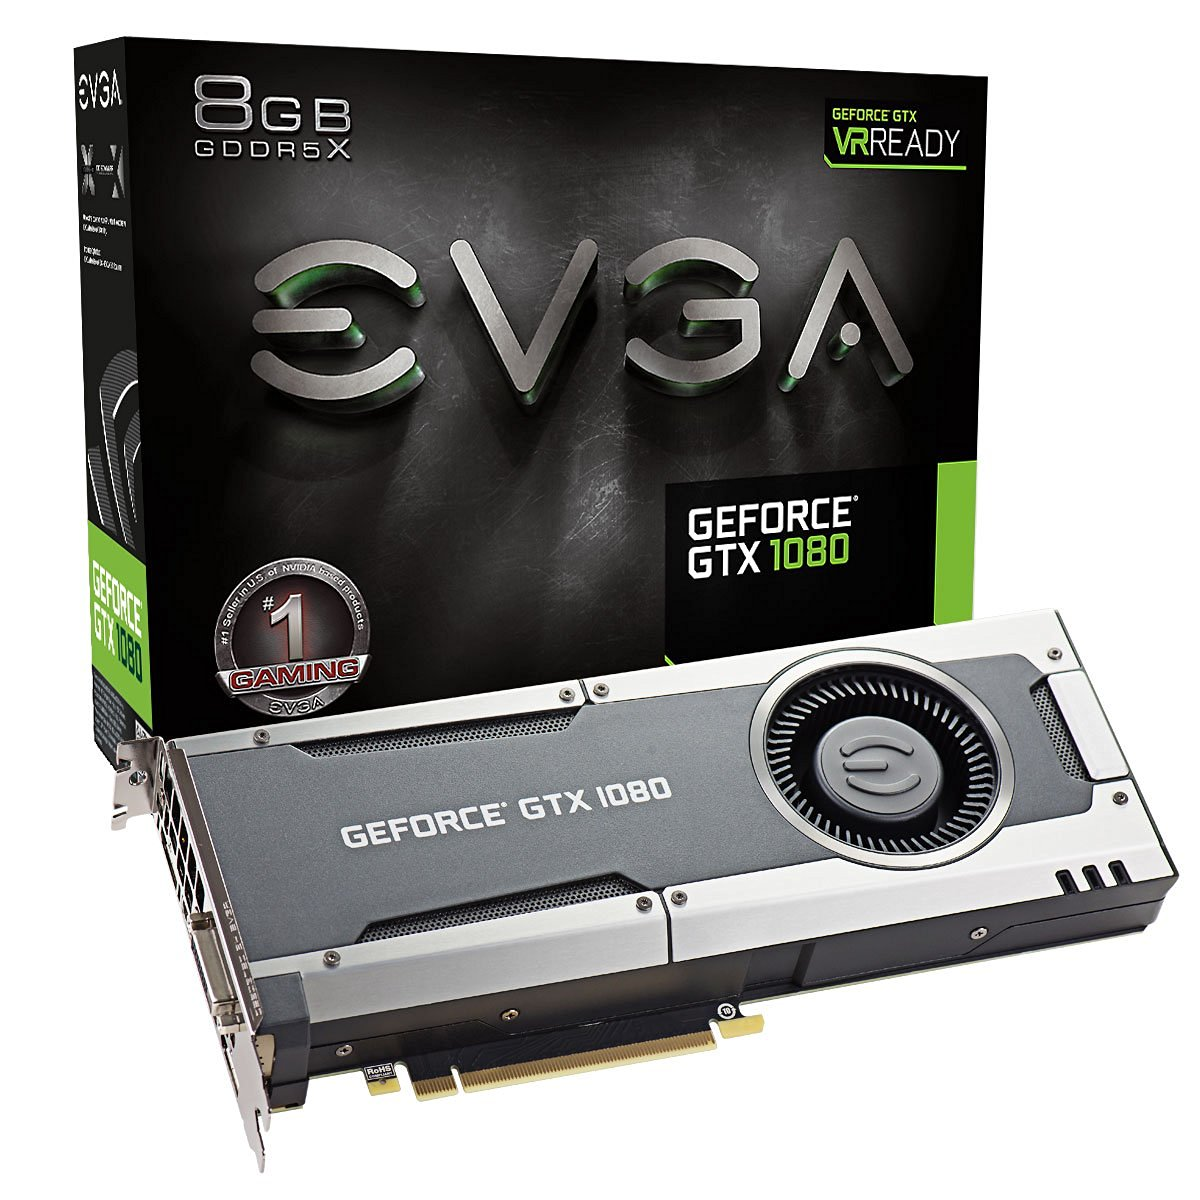 EVGA GeForce GTX 1080 GAMING 8GB VR Ready Graphics Card | 08G-P4-5180-KR